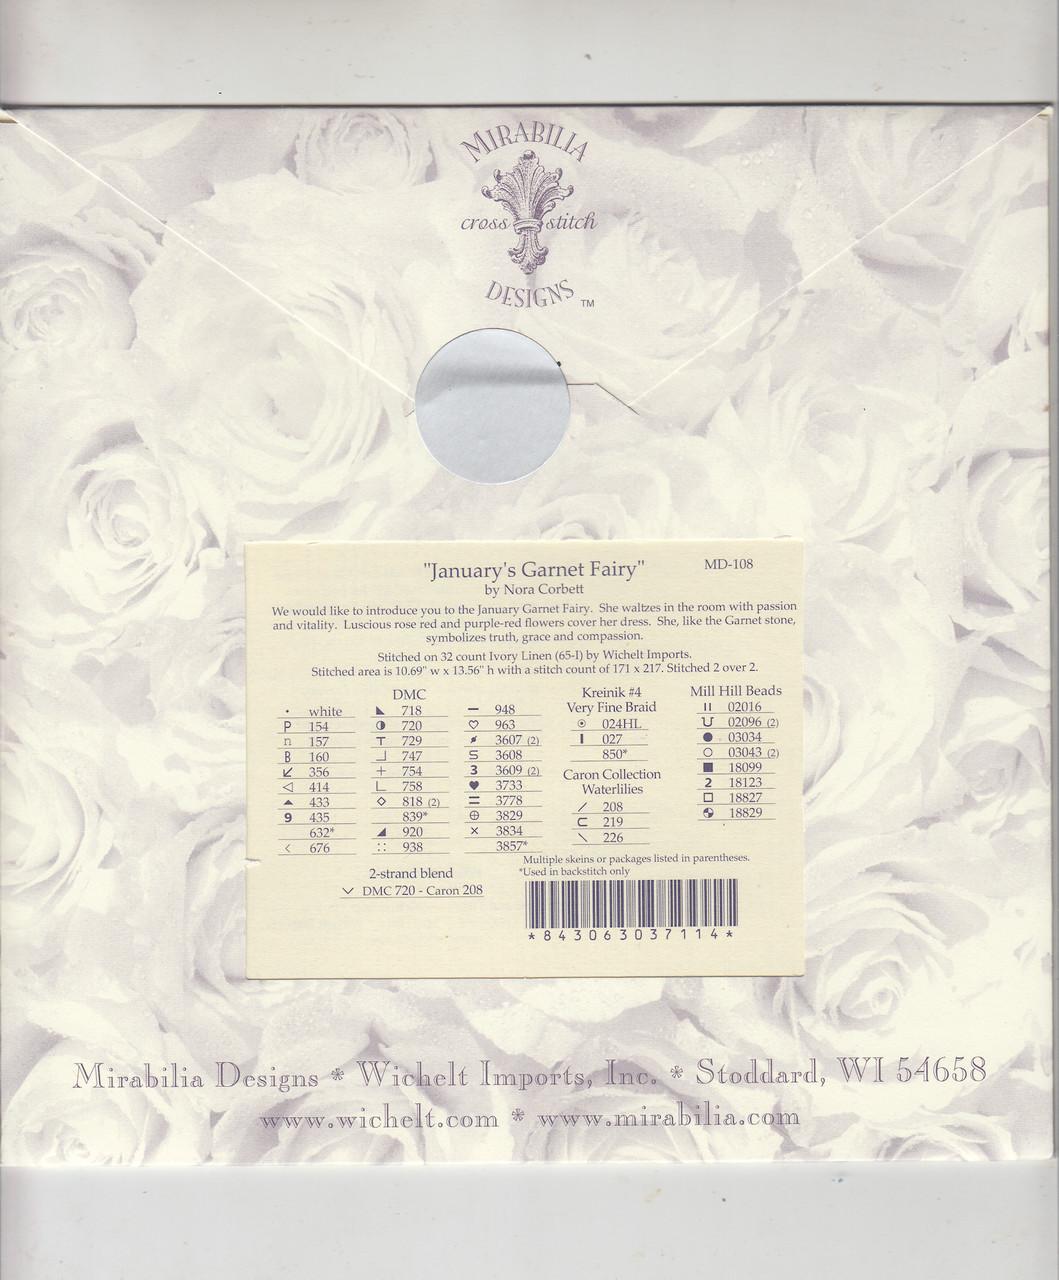 Mirabilia - January's Garnet Fairy